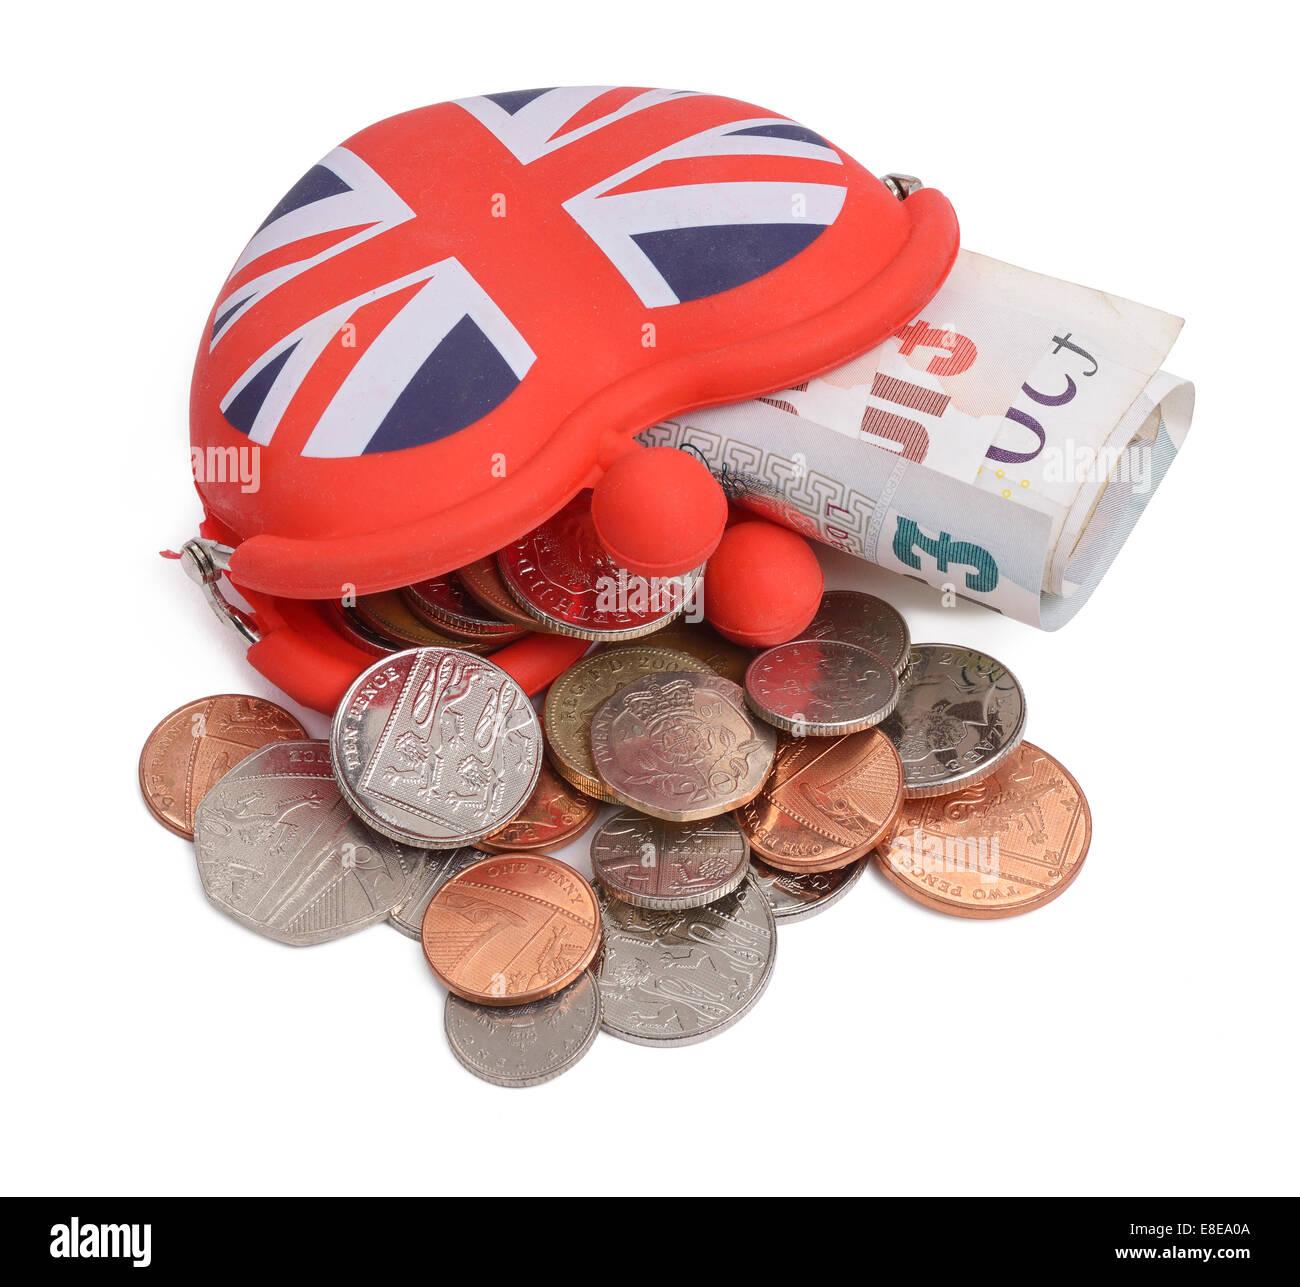 UK purse filled with money - Stock Image